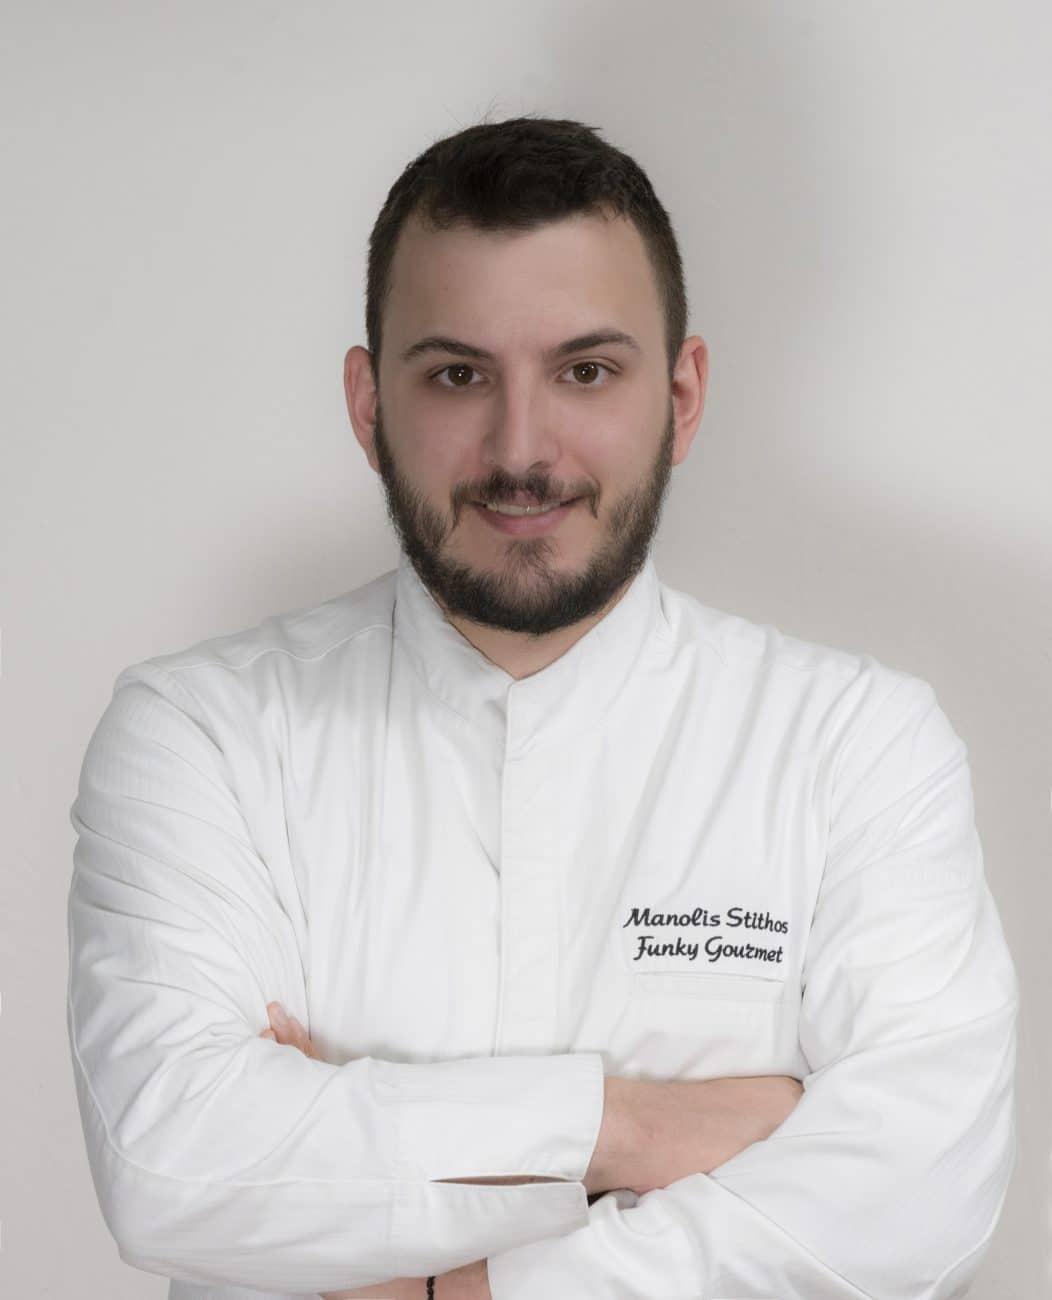 Chef Manolis Stithos